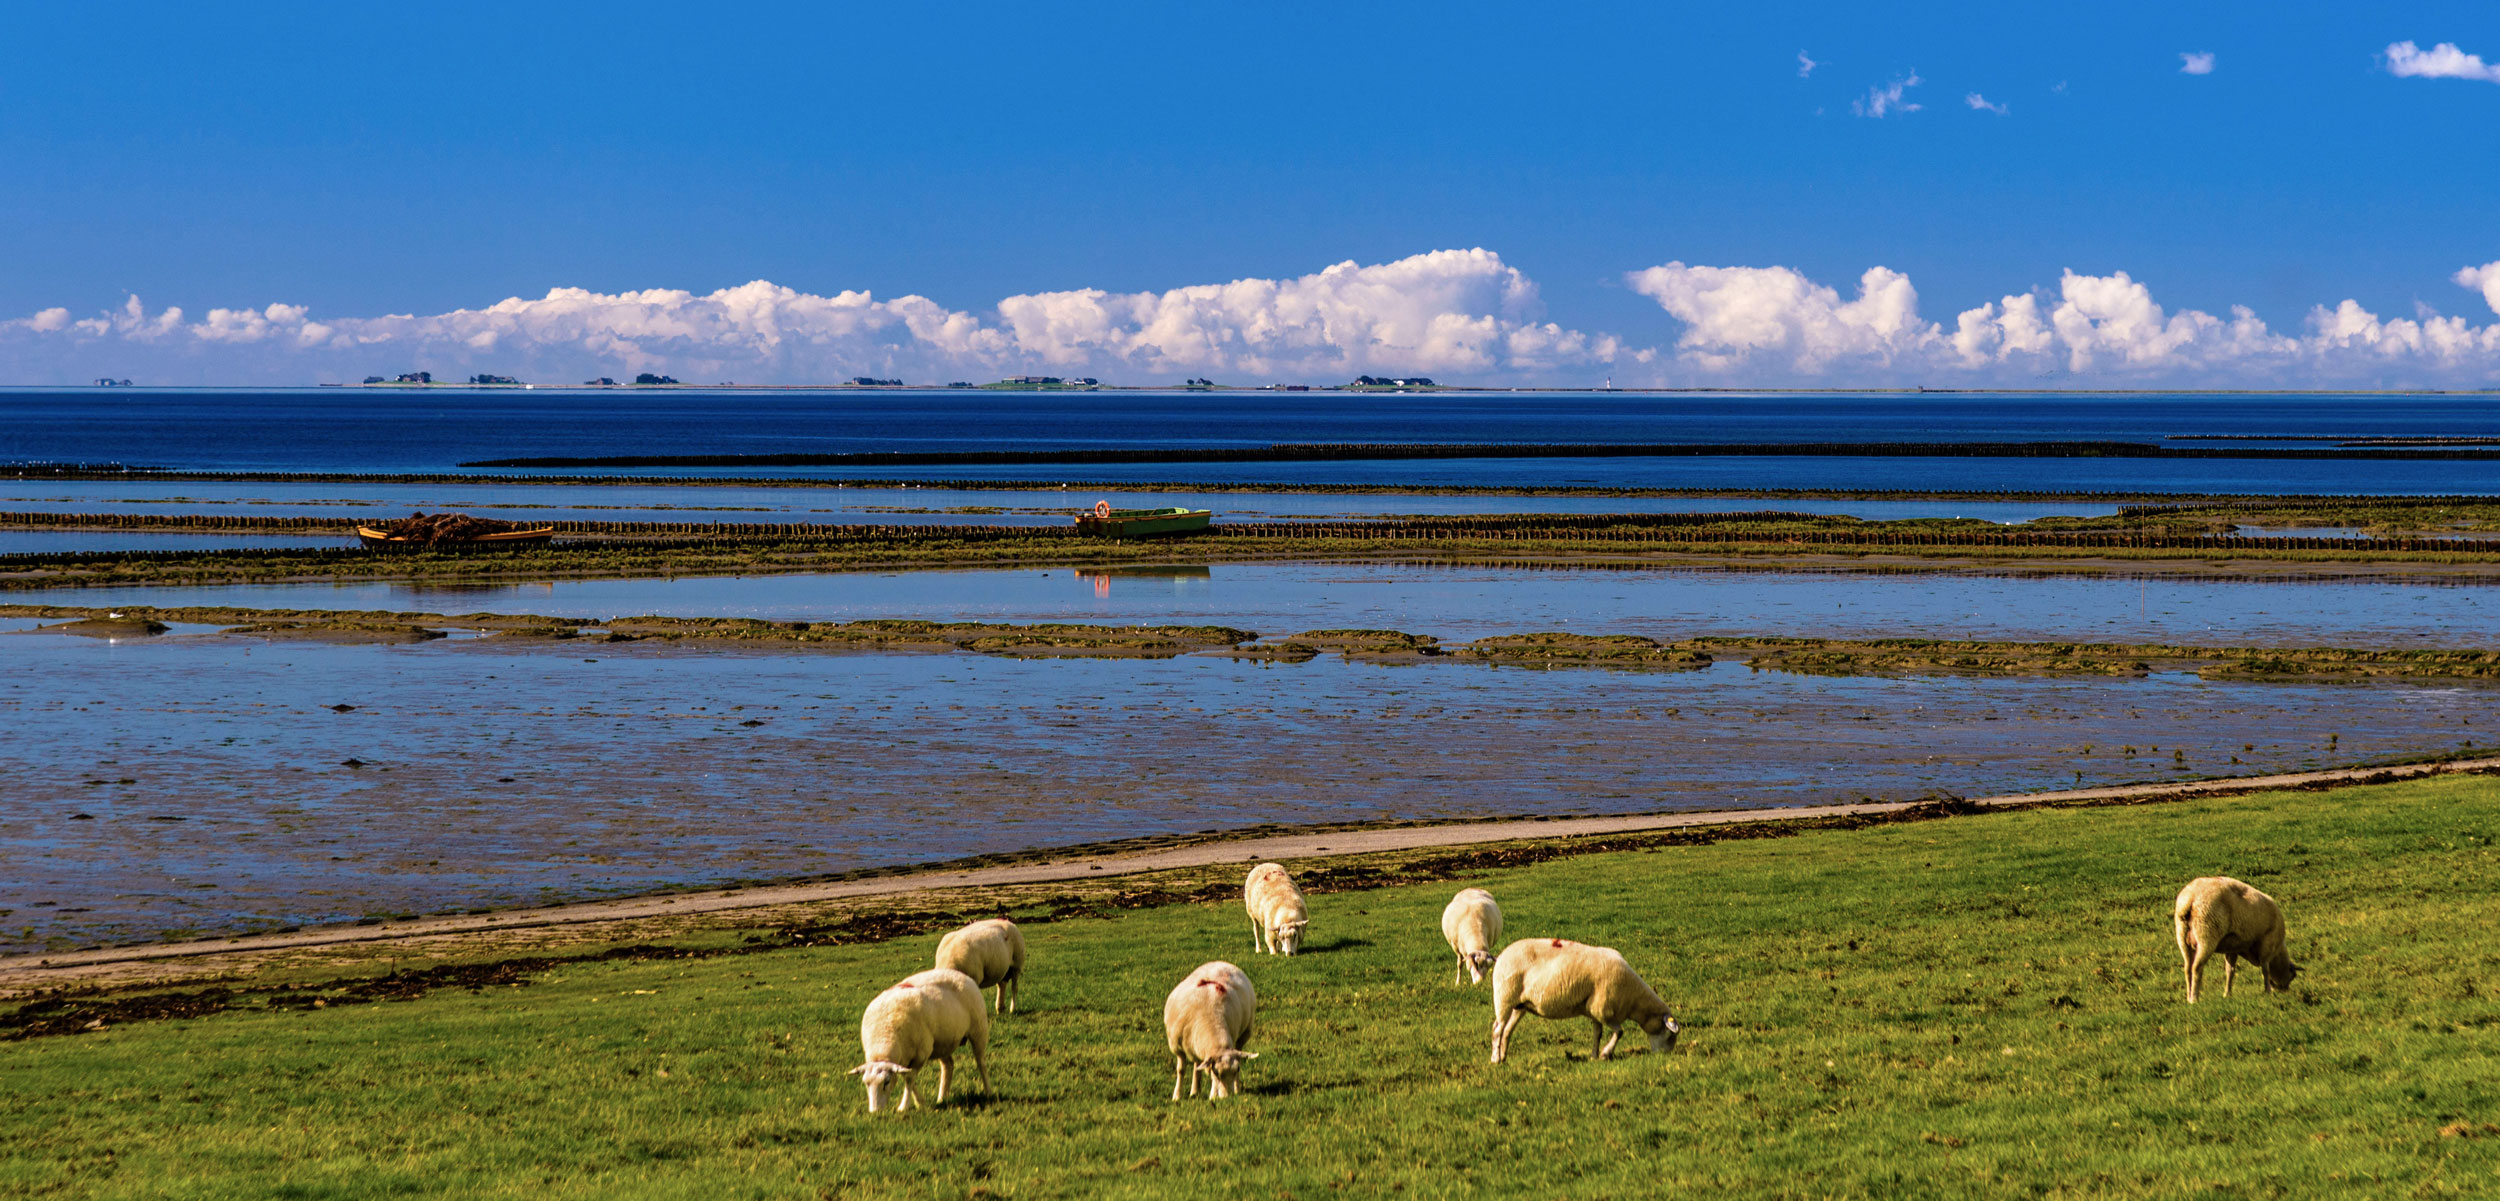 sheep grazing on the Wadden Sea